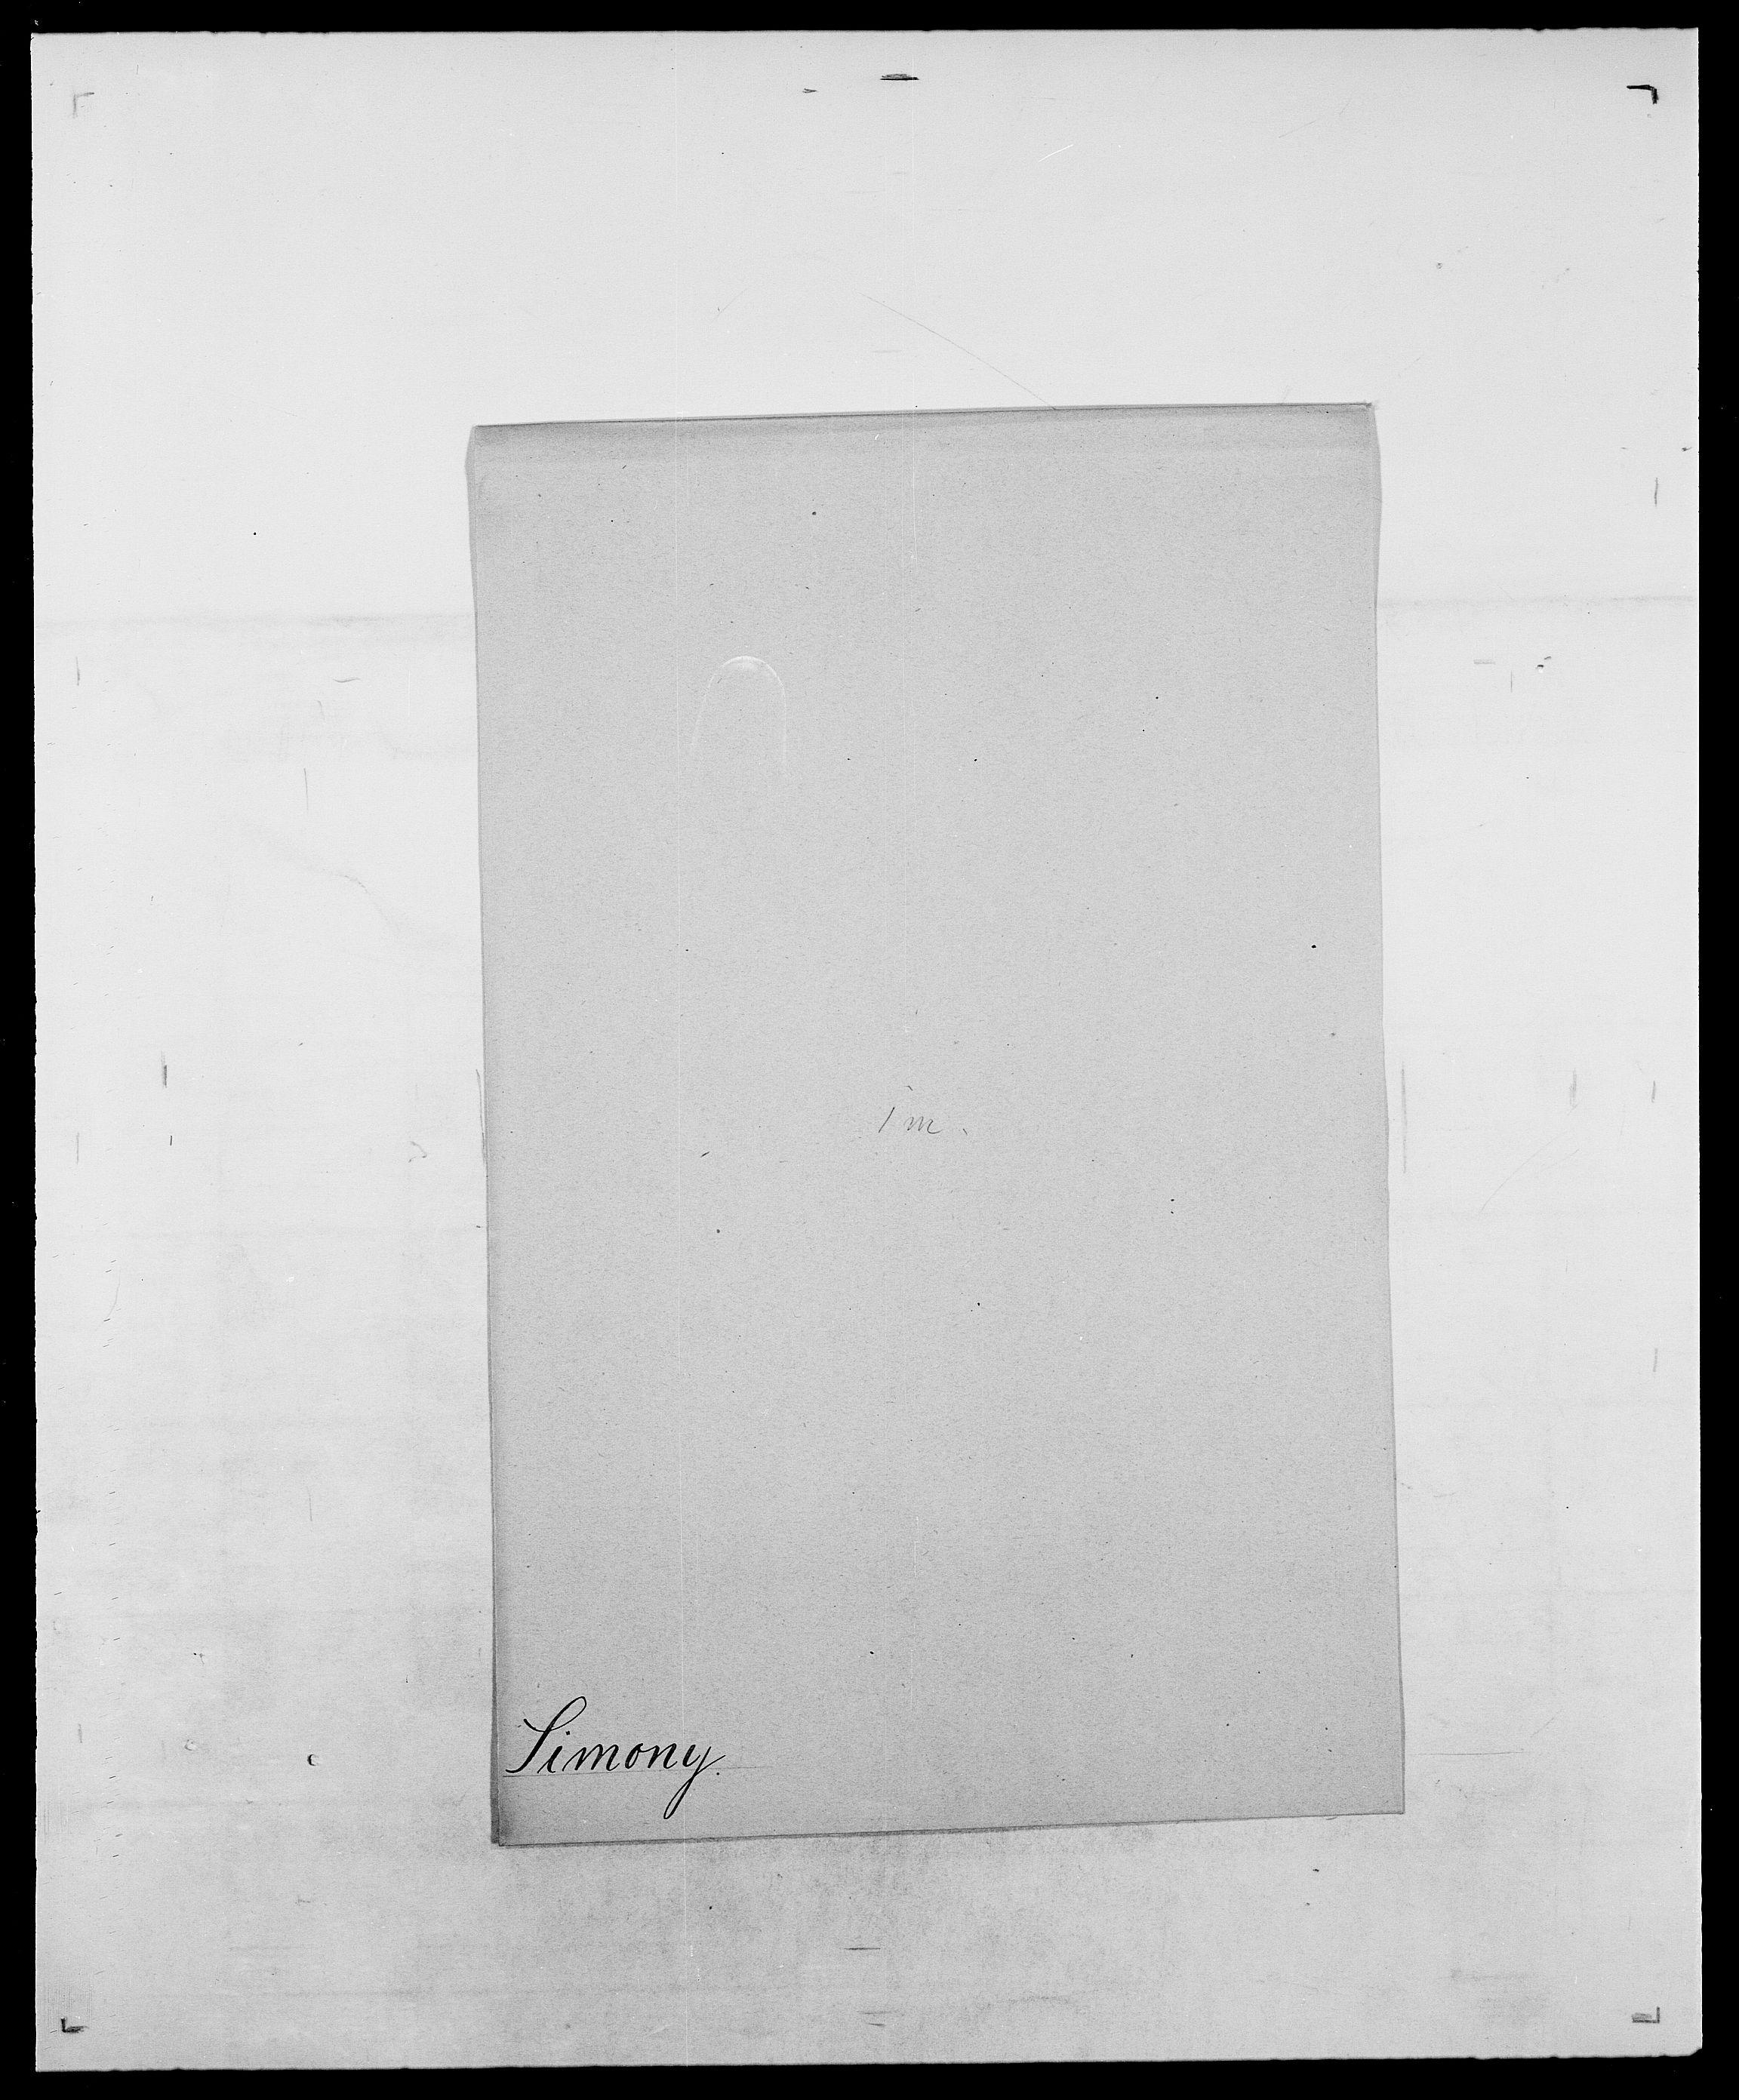 SAO, Delgobe, Charles Antoine - samling, D/Da/L0035: Schnabel - sjetman, s. 824